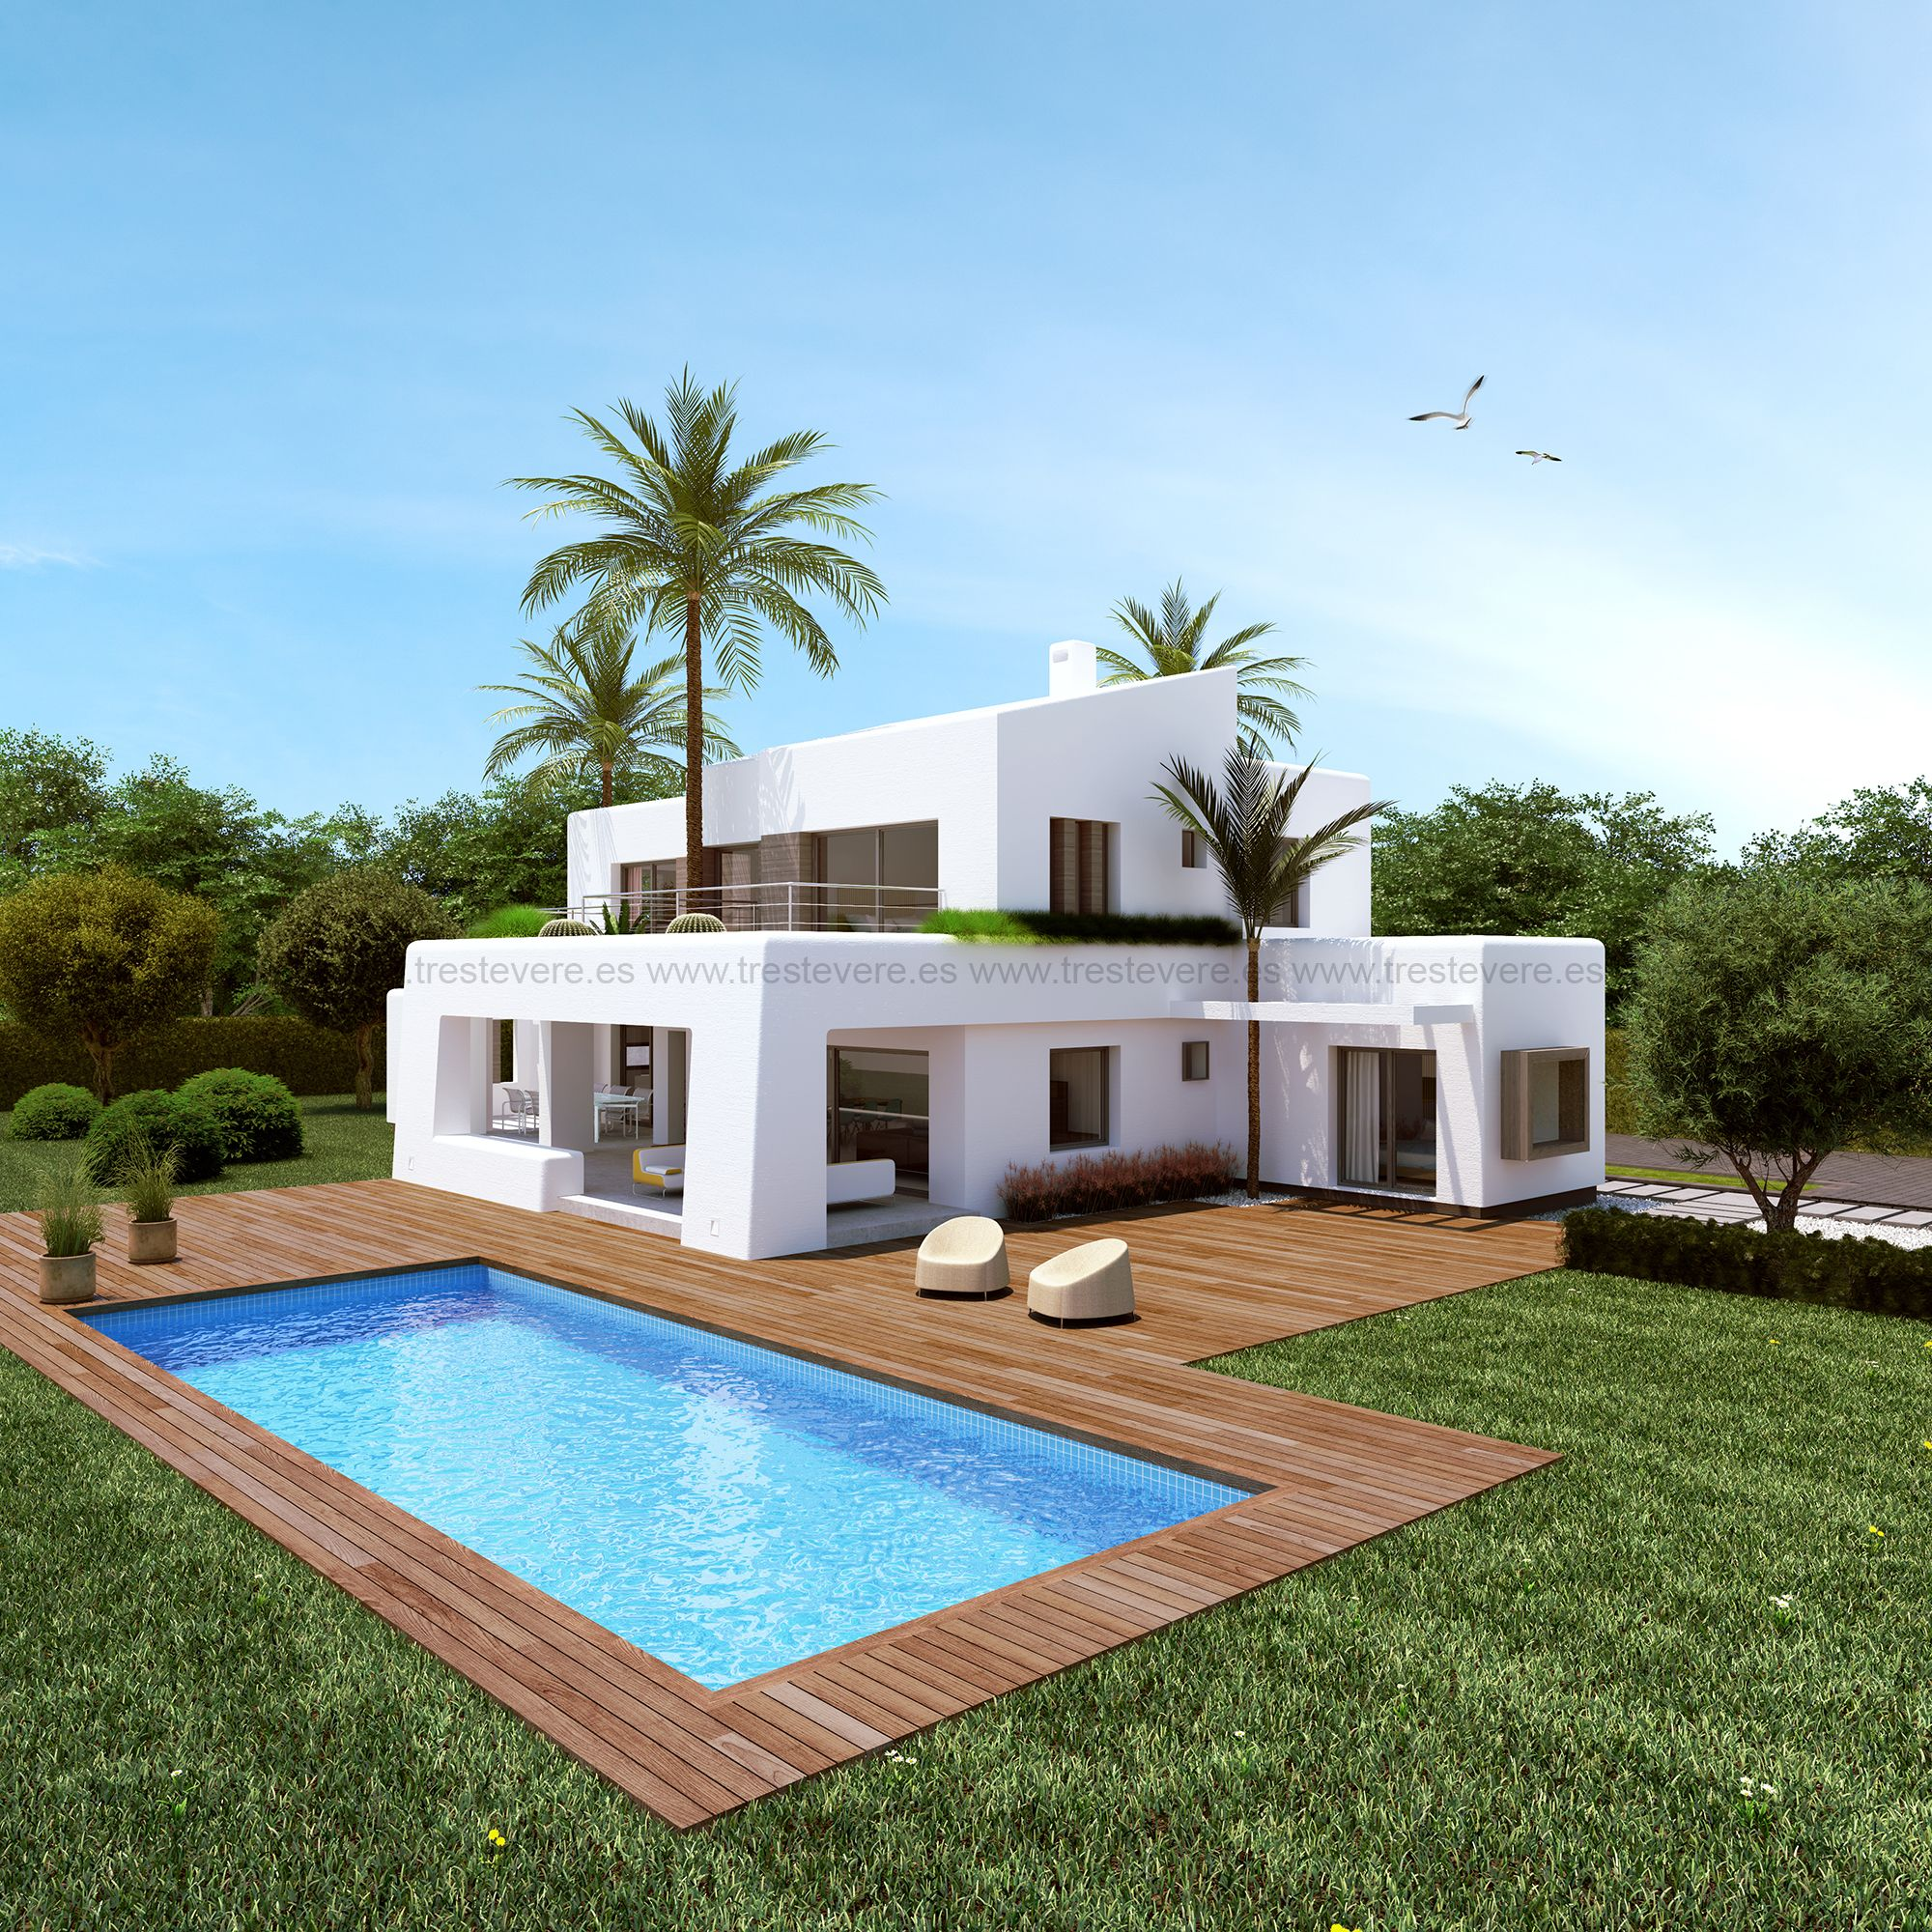 Vivienda moderna 01 casas verano pinterest viviendas for Viviendas modernas